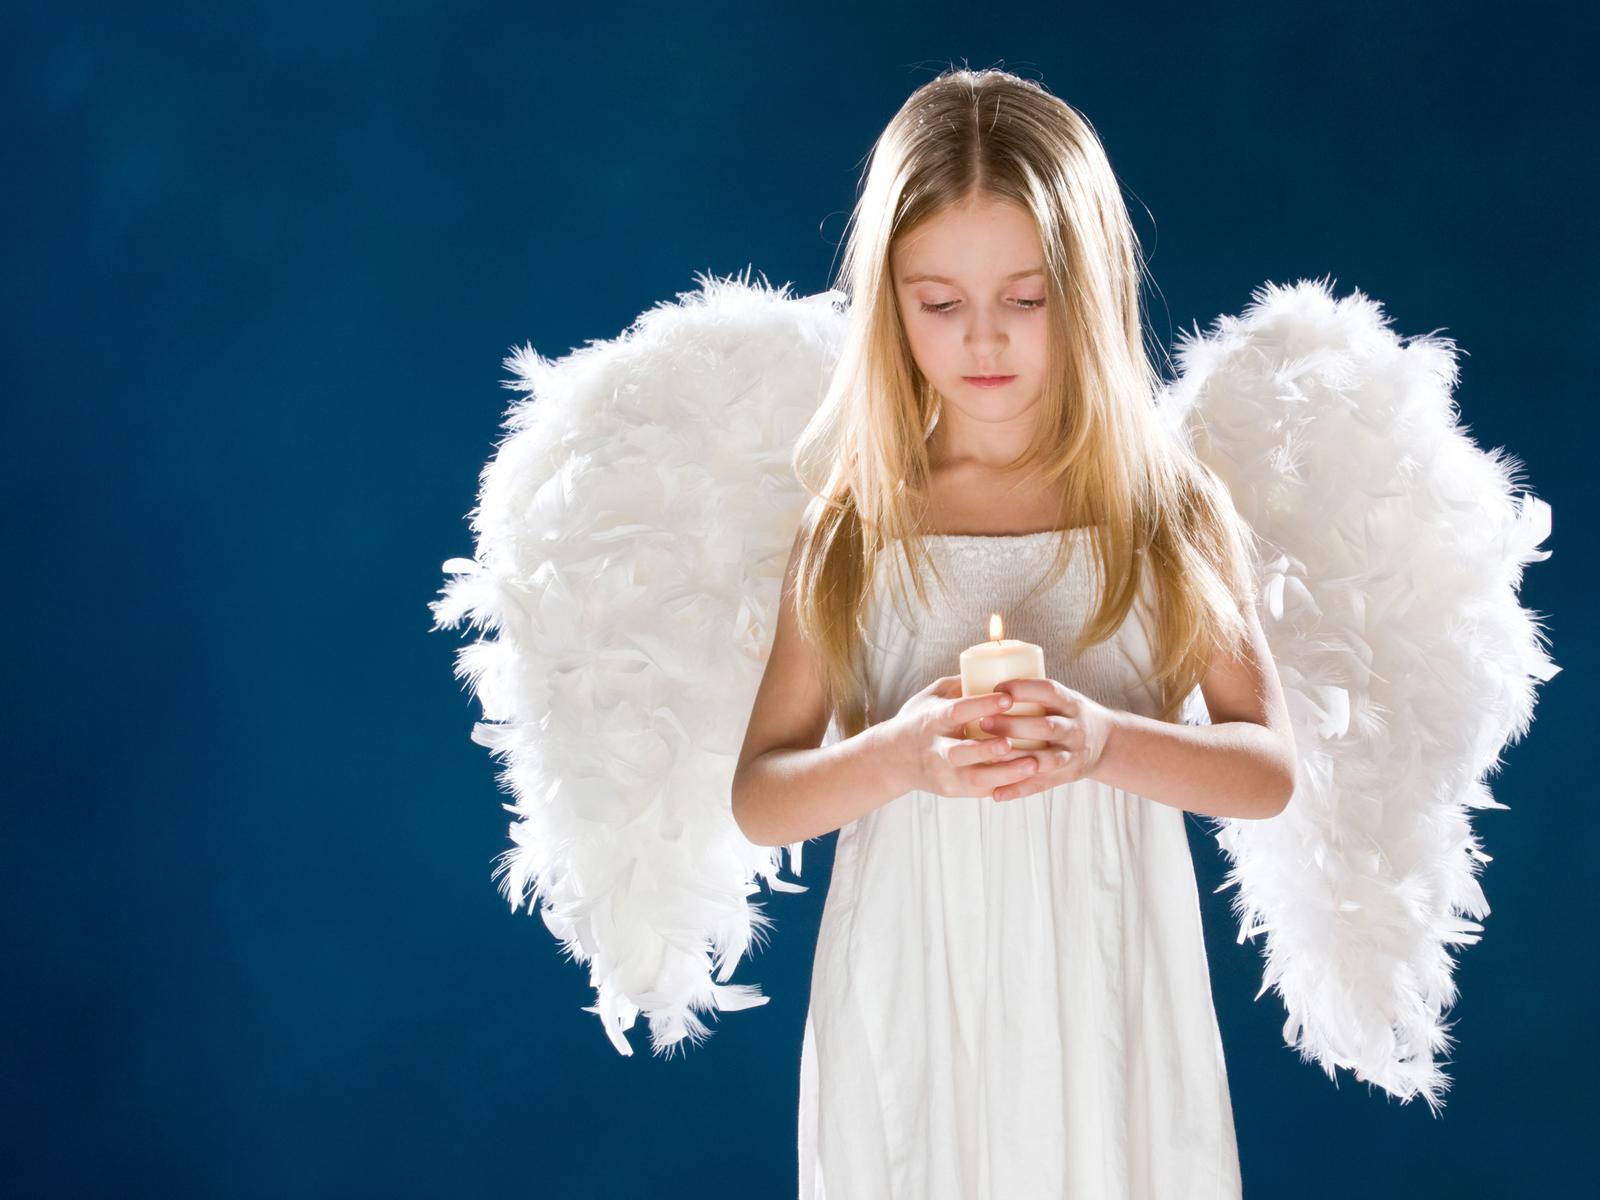 обоев ангелочек картинки фото фото пластинки были